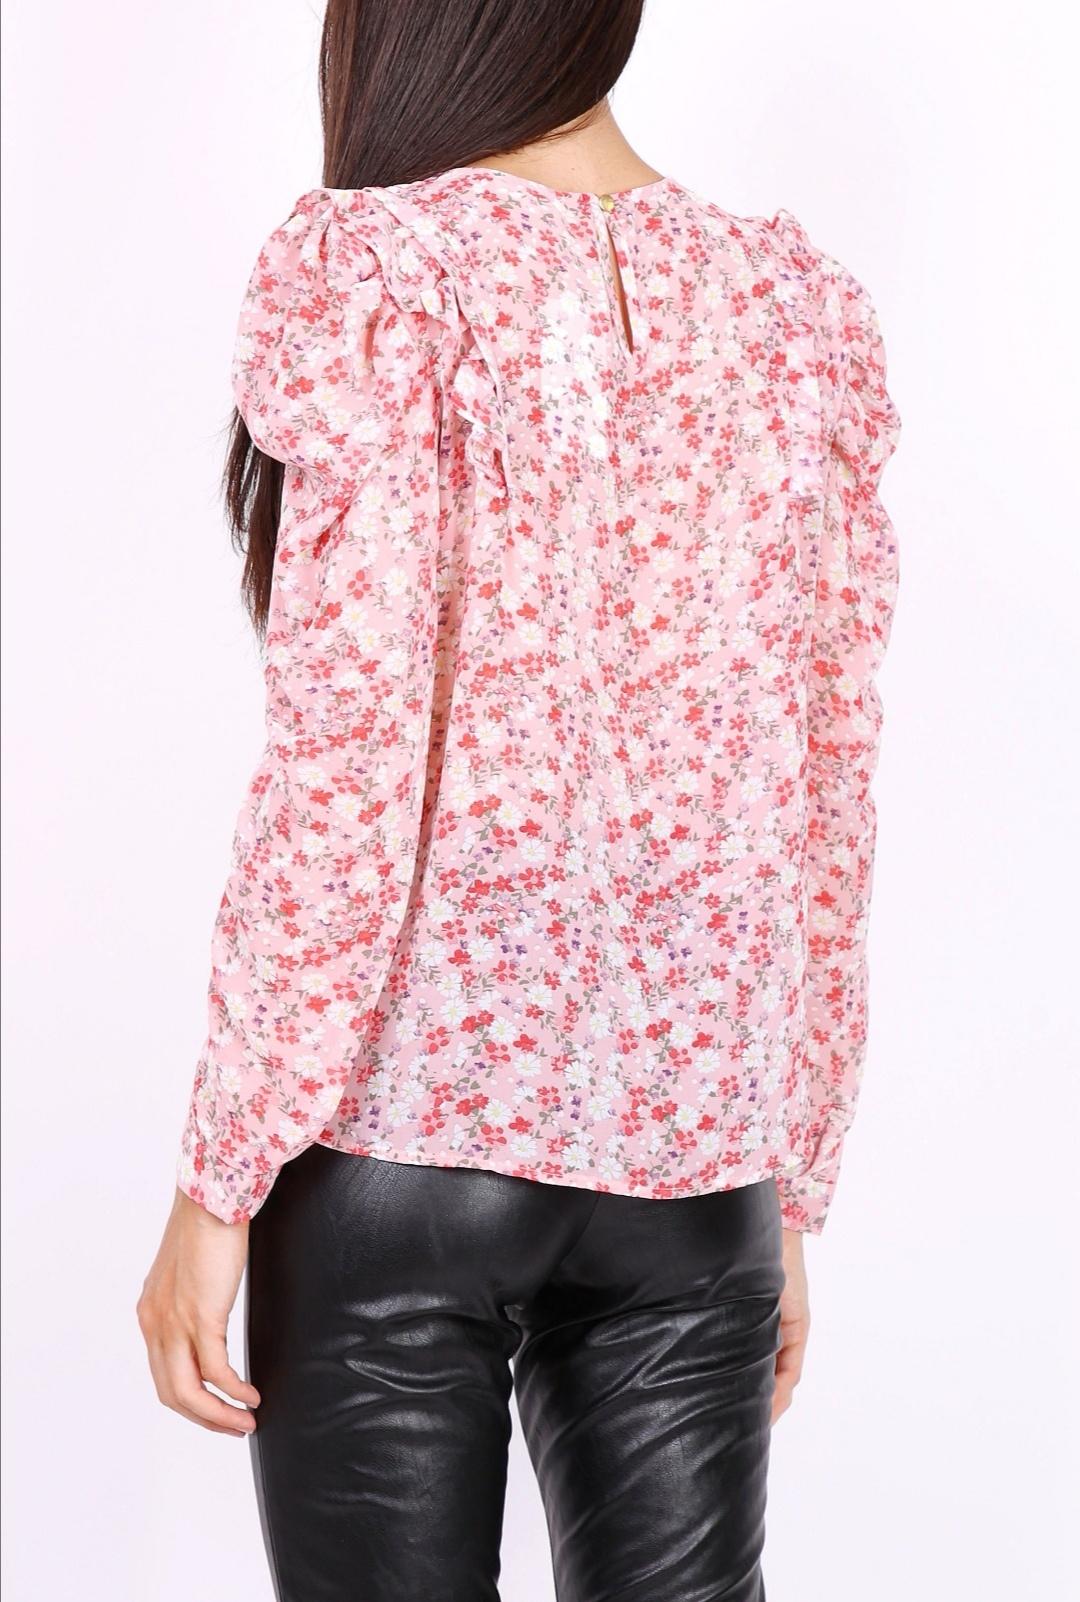 PEPITES blouse charline-6